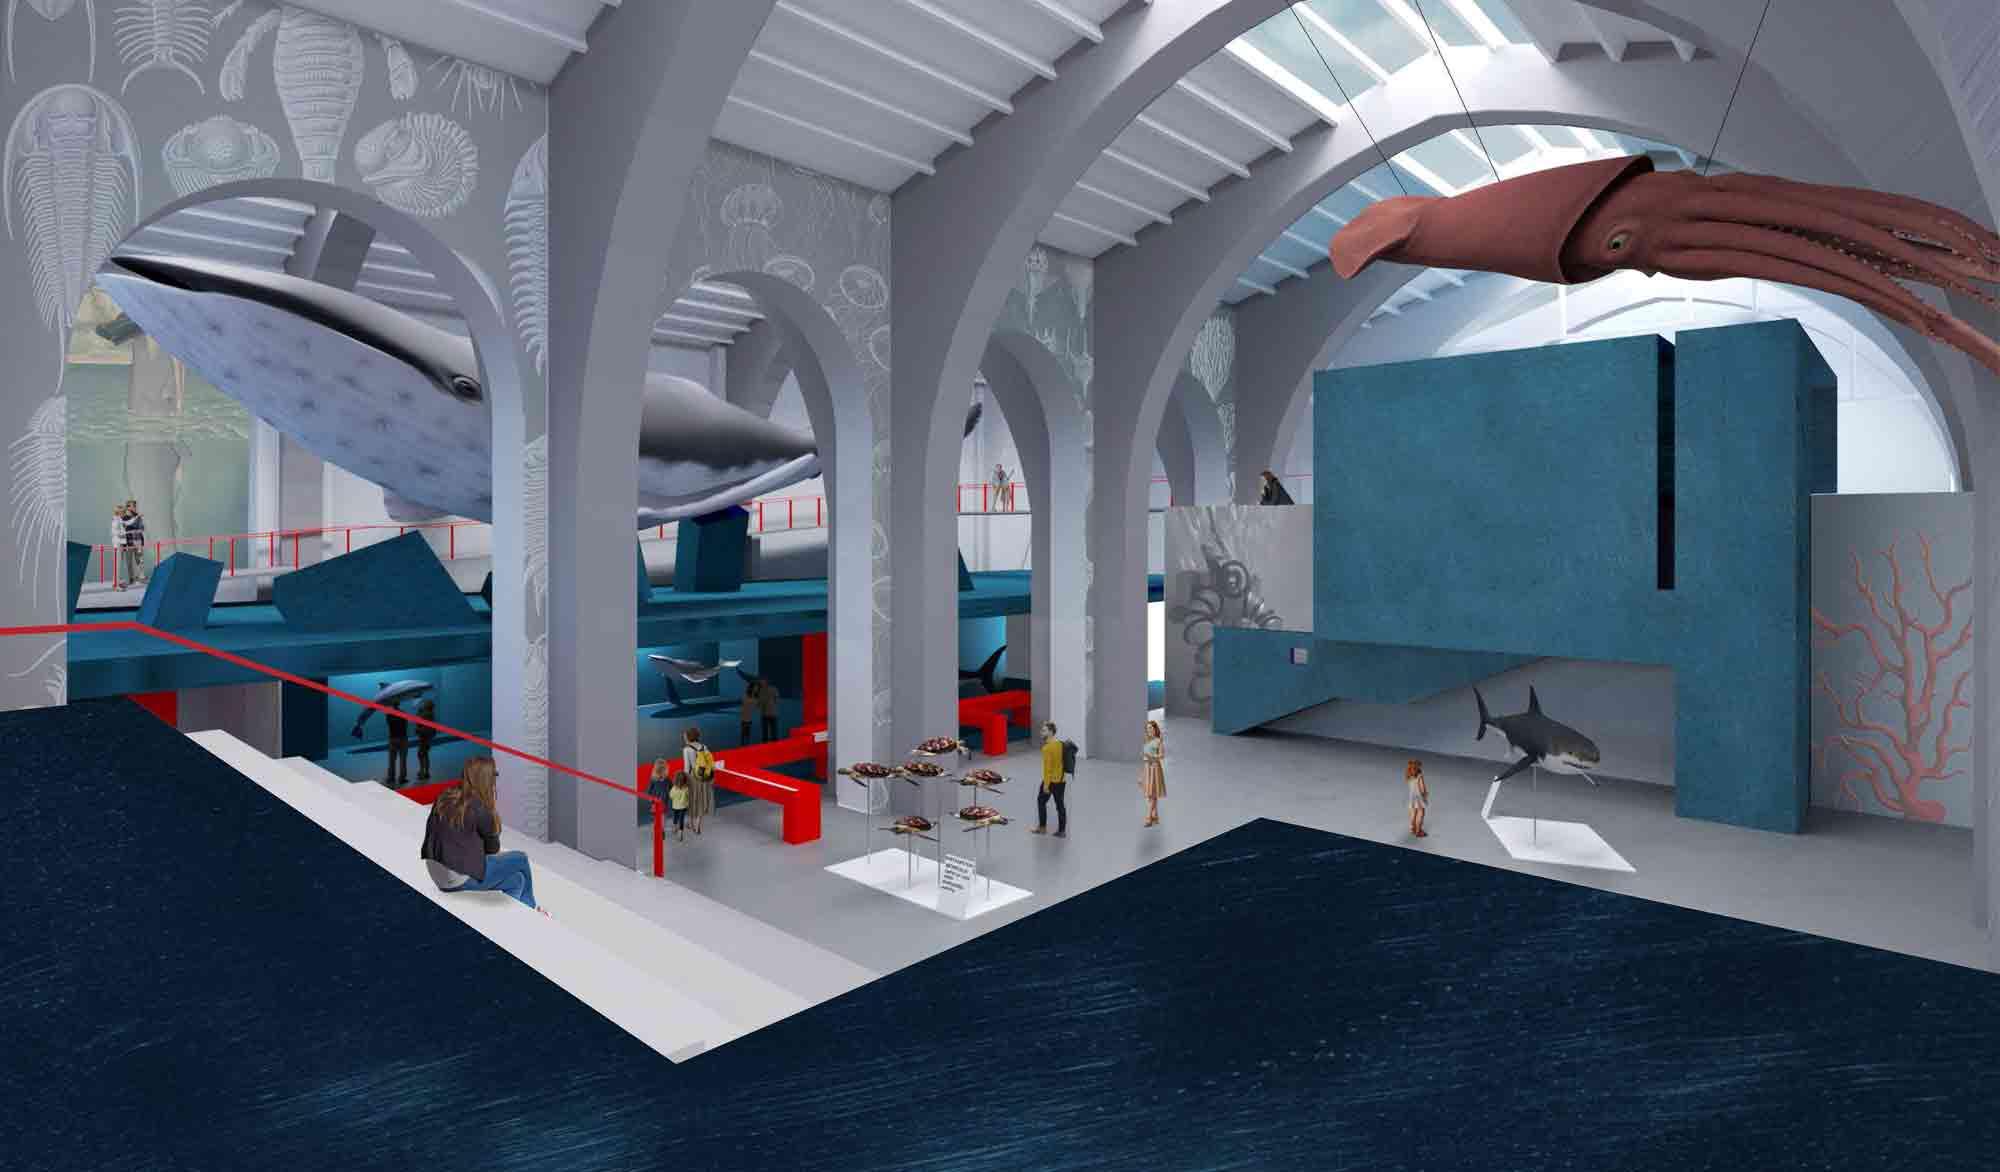 Concorso-Santuario-dei-Cetacei-CNC_MCE_1_P_001_Render-StudioGamp-it-Architettura